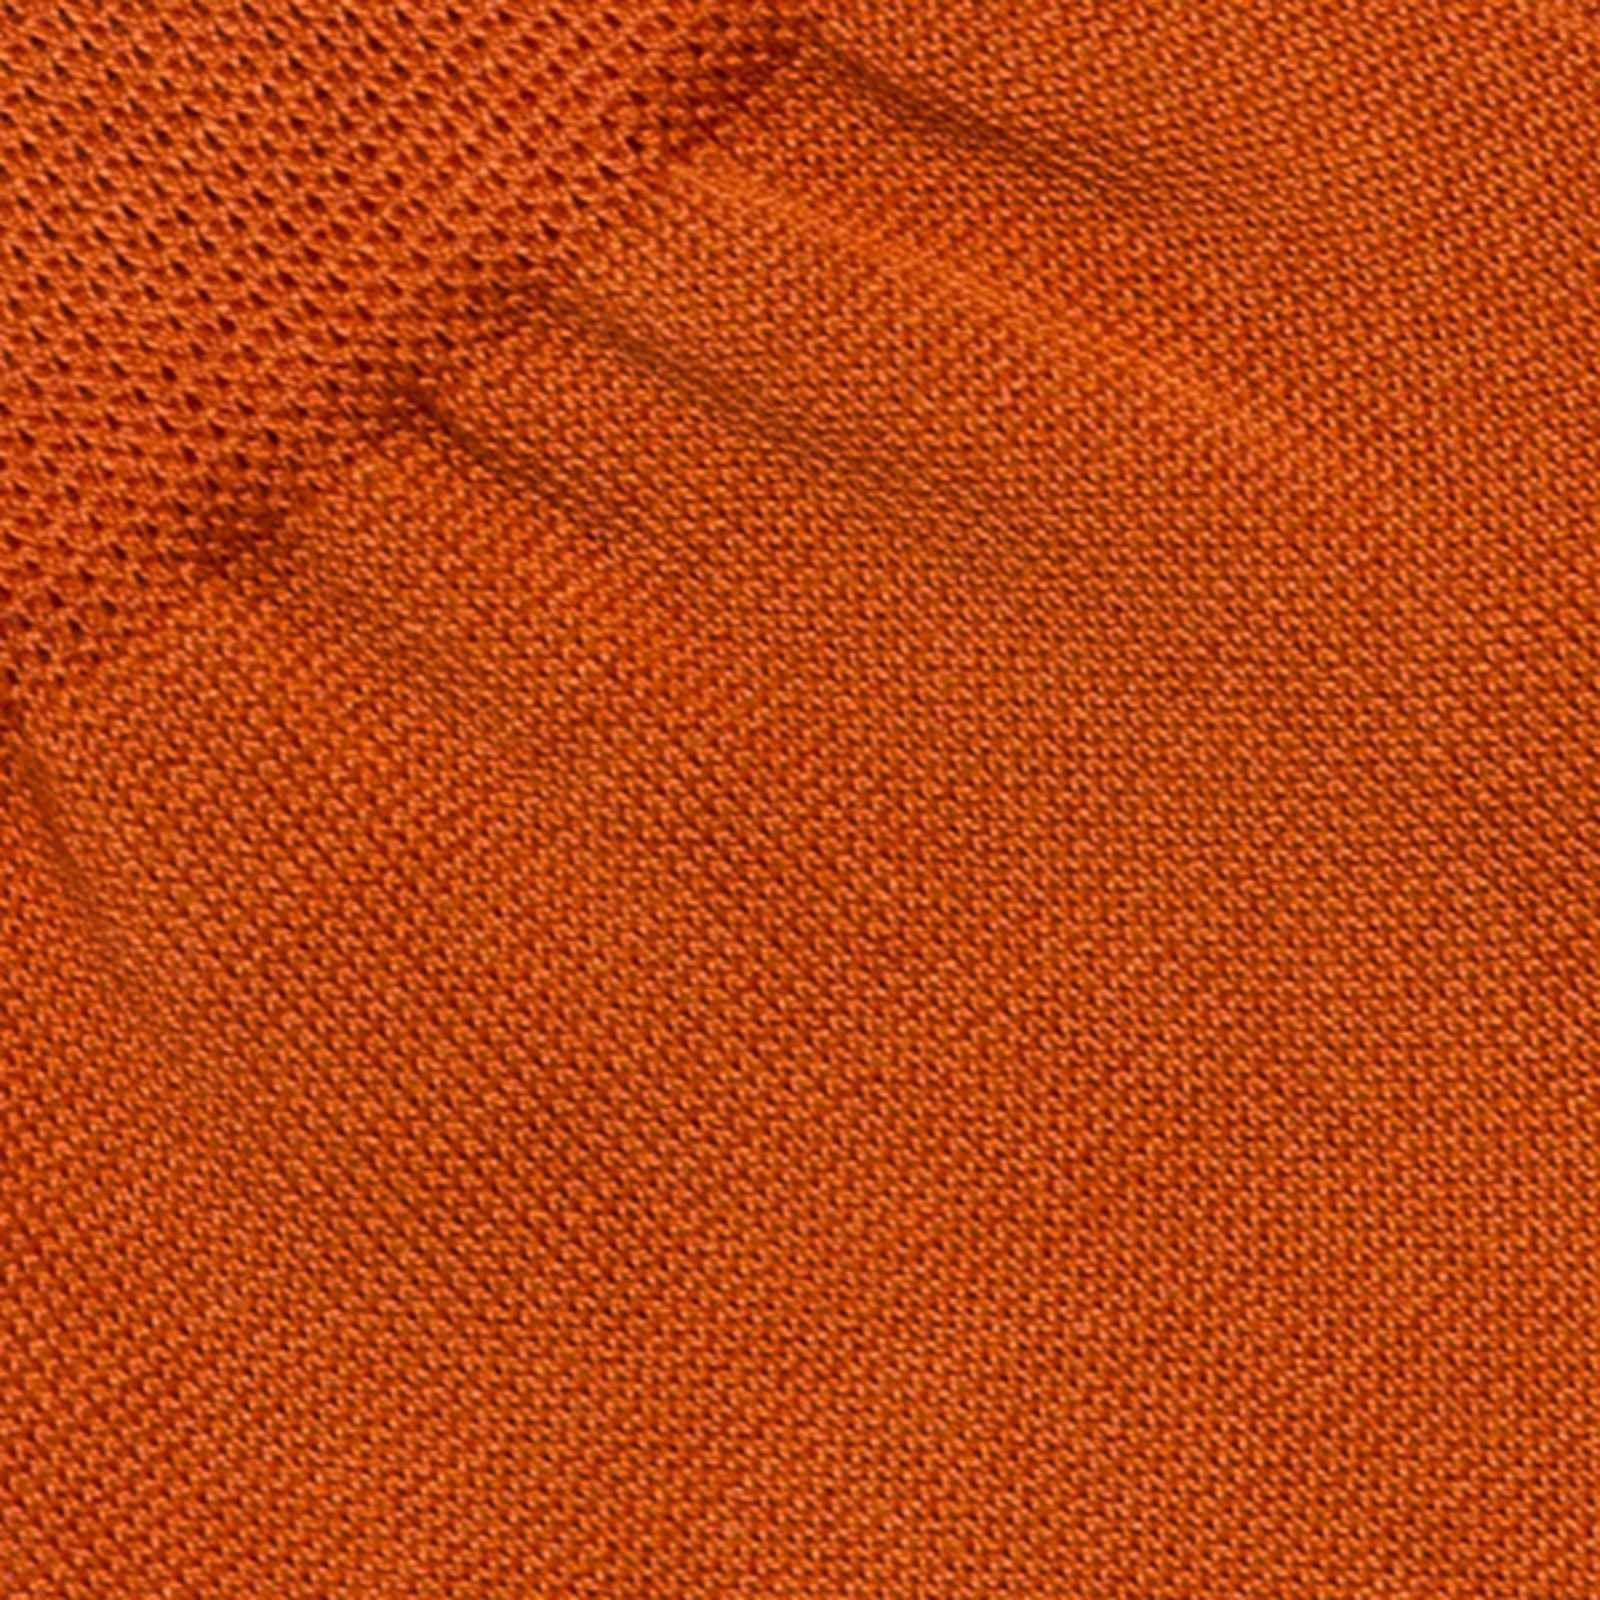 Carlo Lanza Orange cotton socks